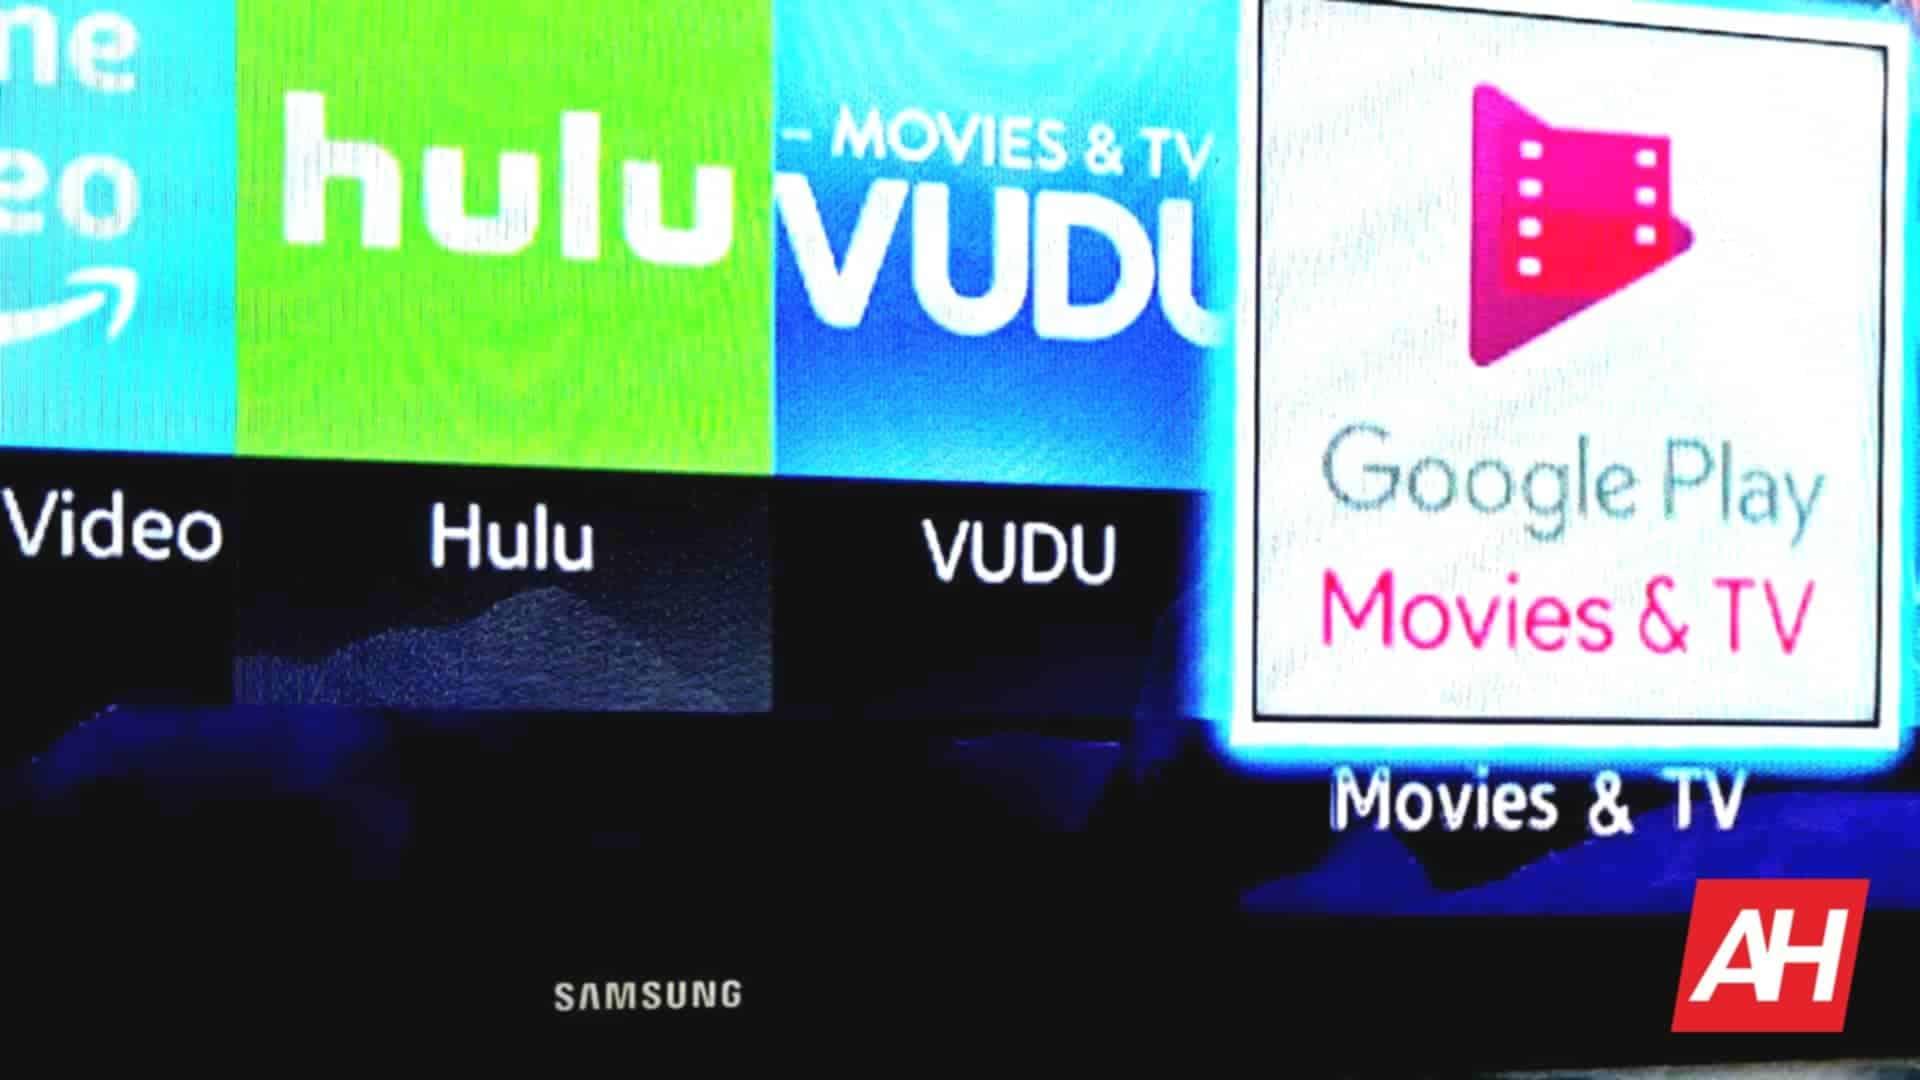 Samsung Google Play Movies Smart Hub DG AH 2020